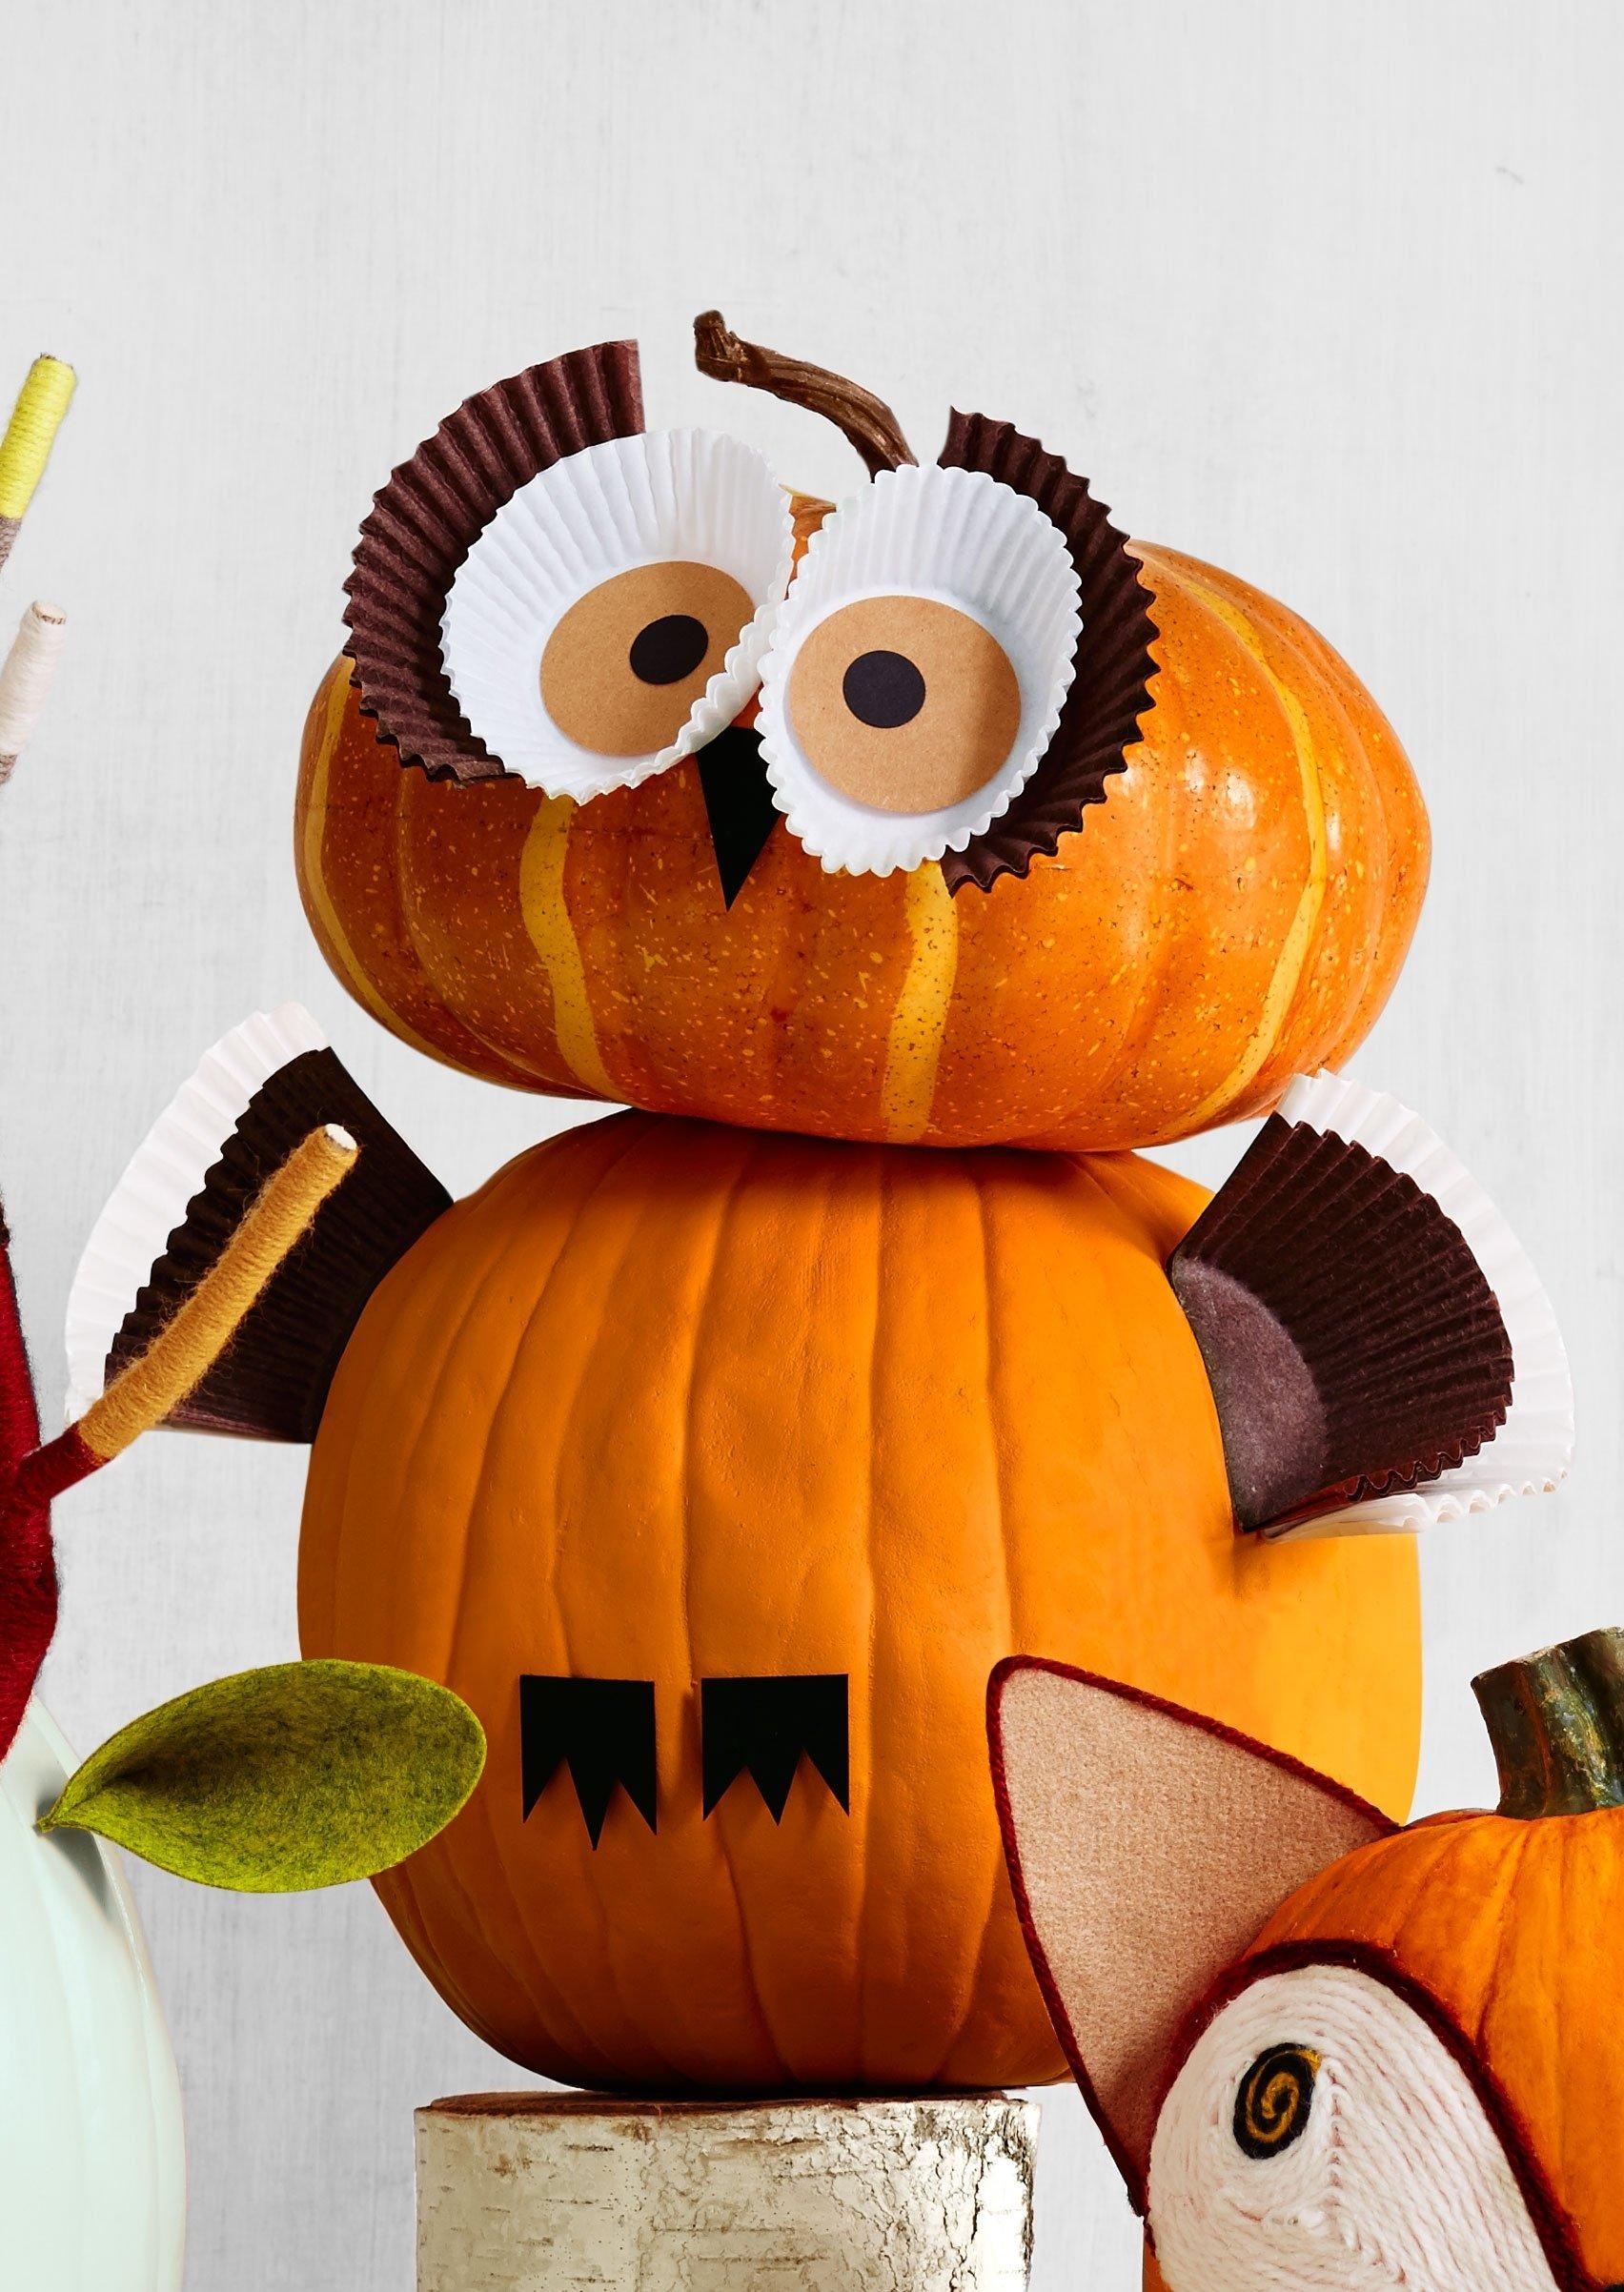 10 Fashionable Creative Pumpkin Ideas No Carving 5 pumpkin decorating ideas for toddlers parenting loversiq 1 2020